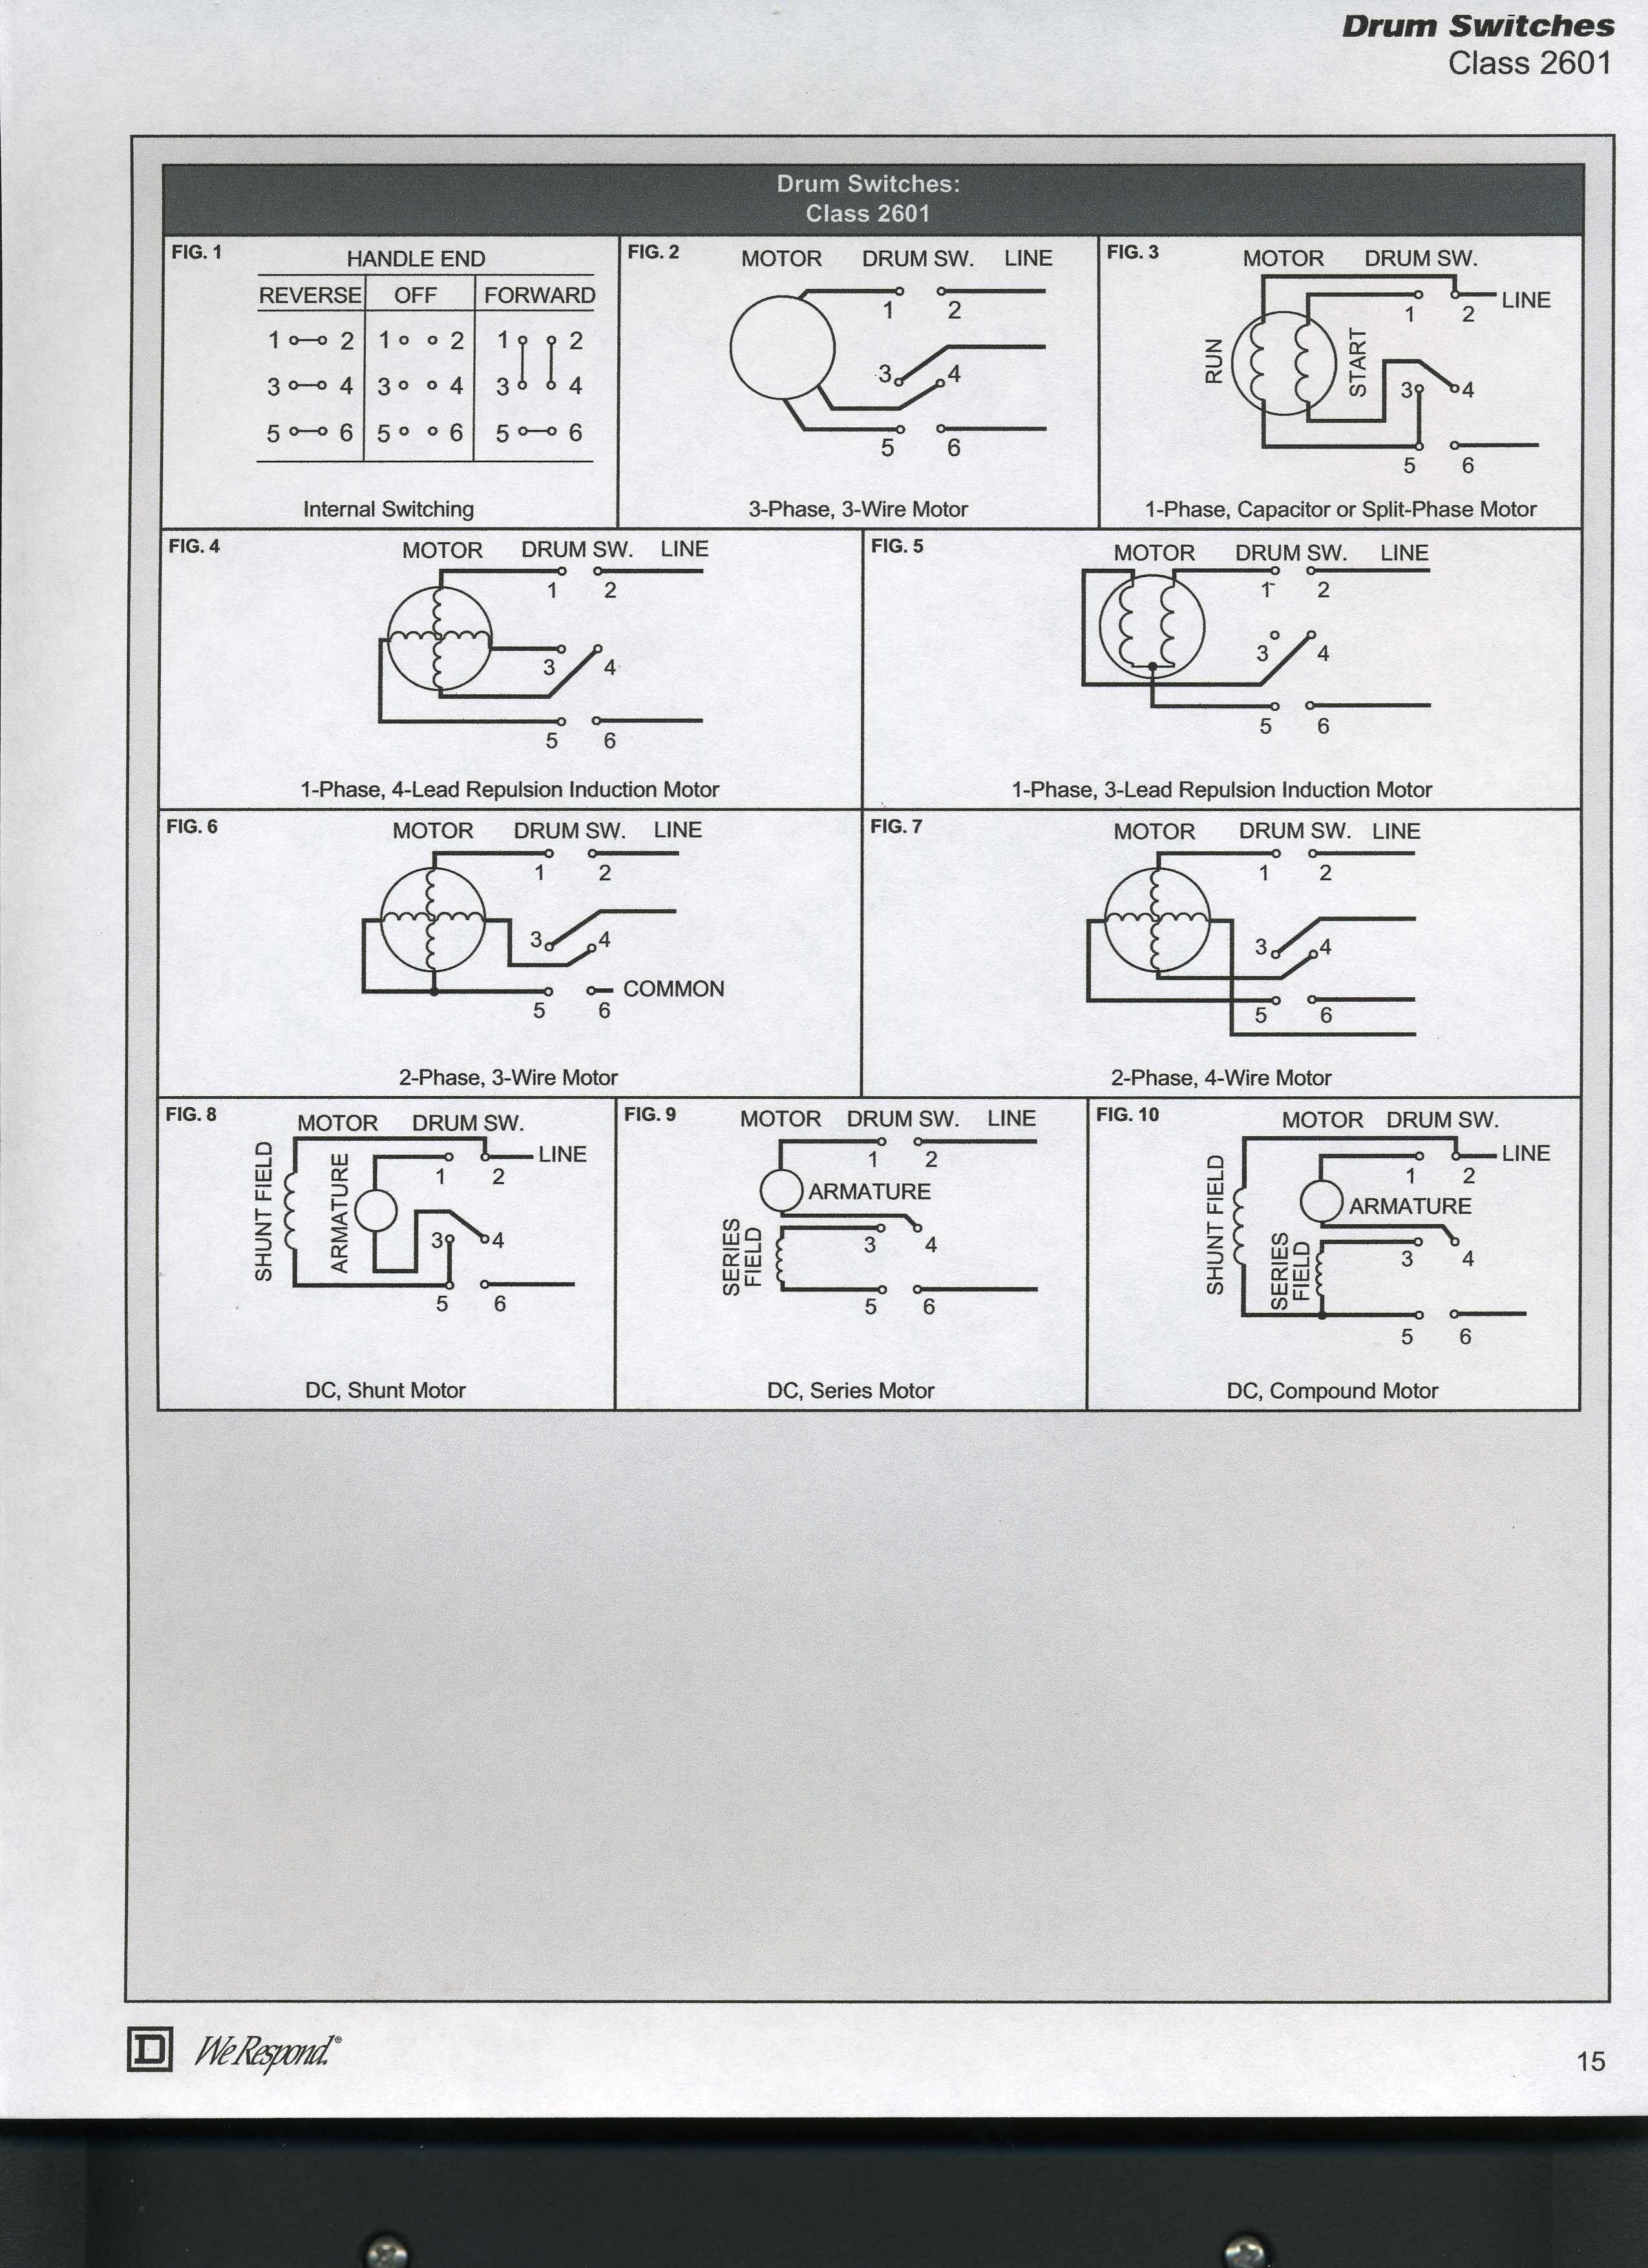 small resolution of unique wiring diagram baldor electric motor diagram diagramsampleunique wiring diagram baldor electric motor diagram diagramsample diagramtemplate